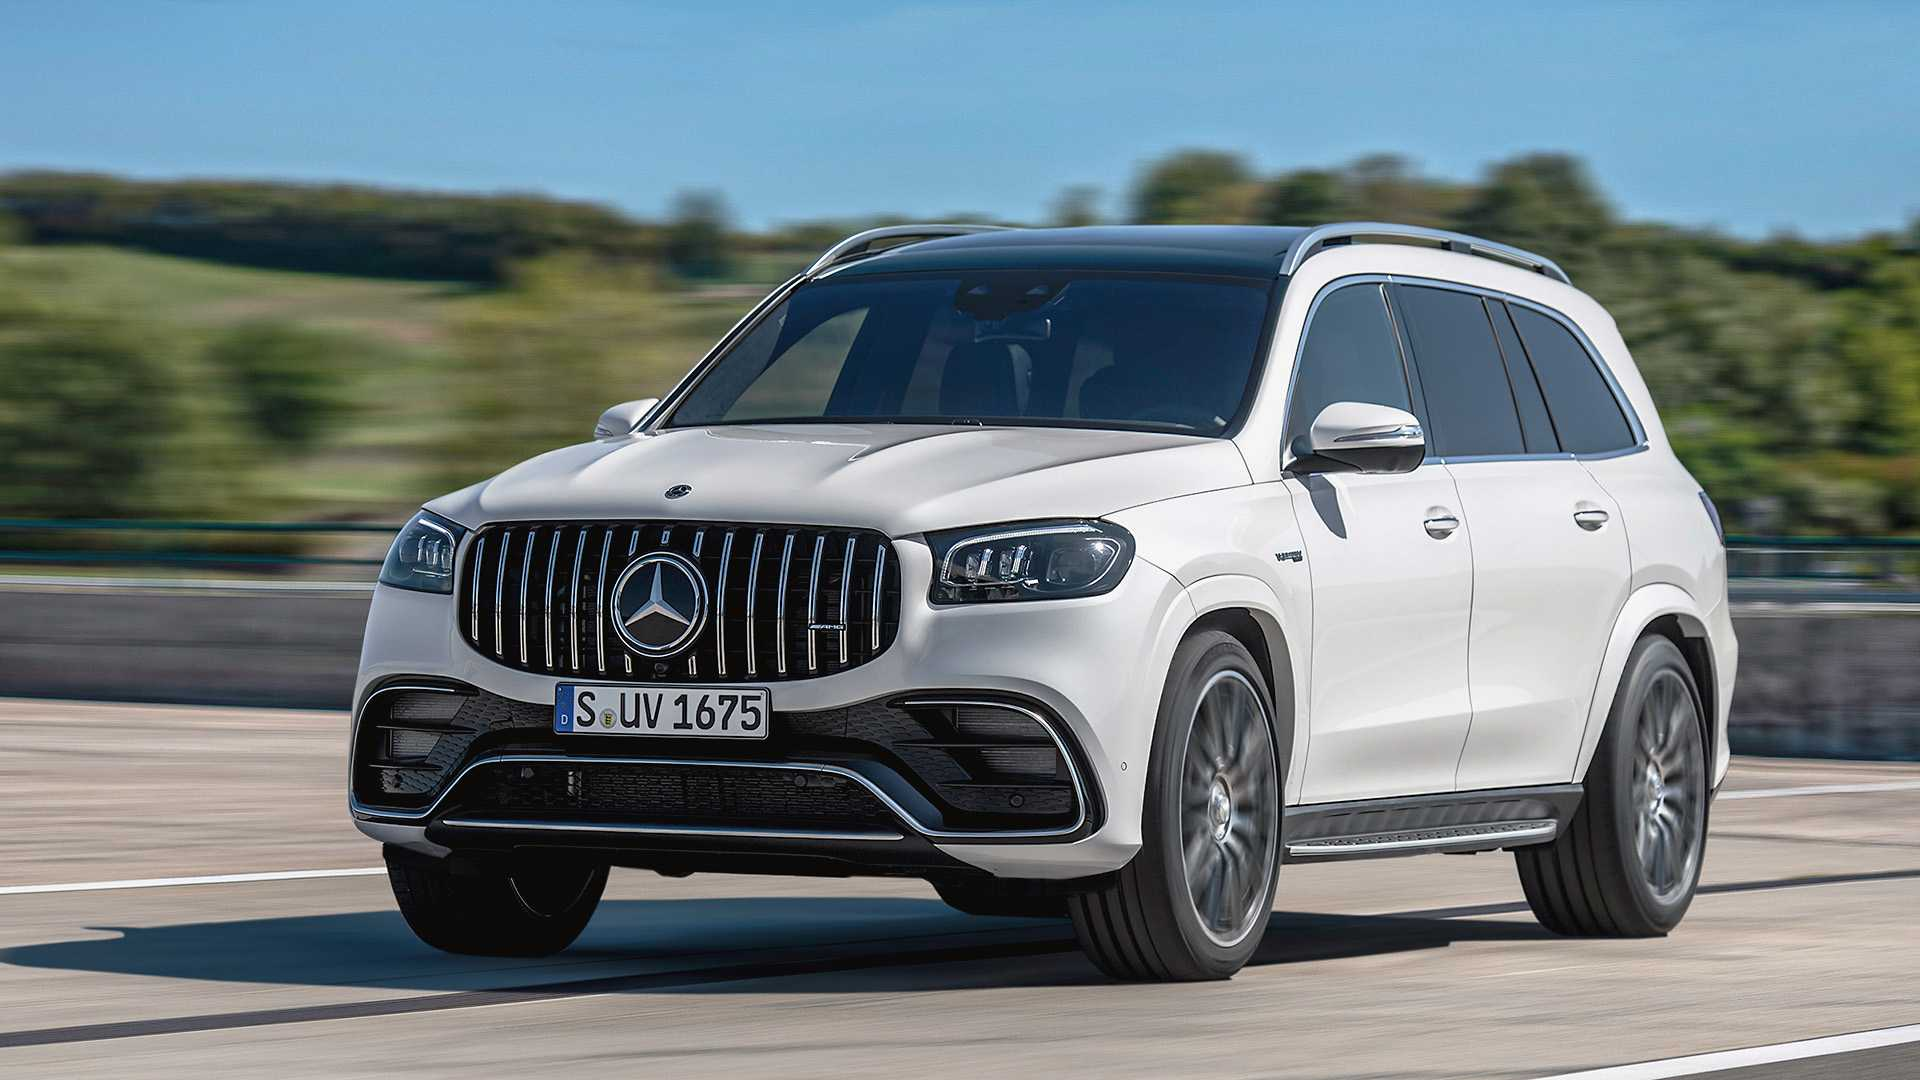 2020 Mercedes GLS Photos